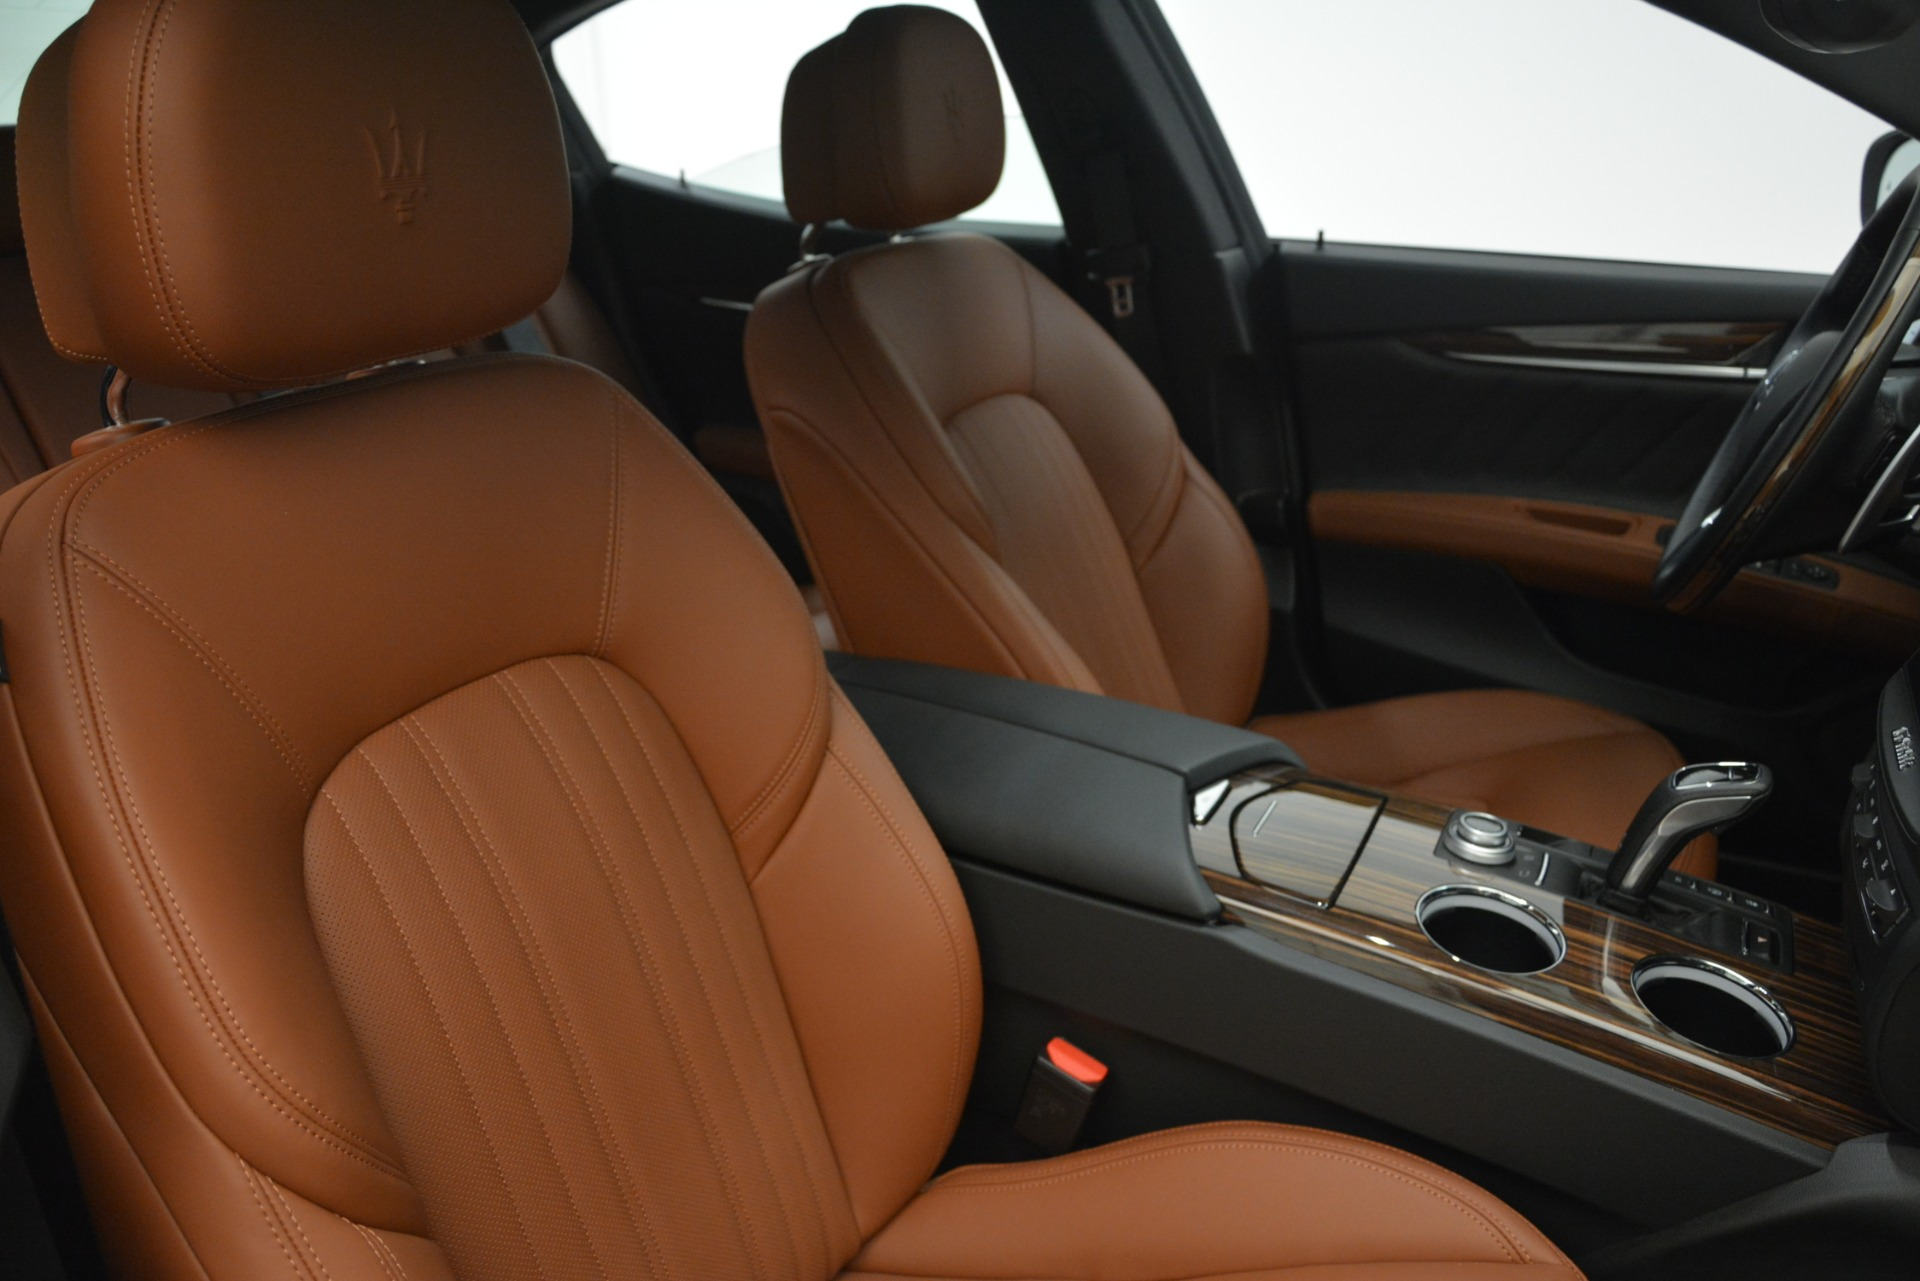 New-2019-Maserati-Ghibli-S-Q4-GranLusso